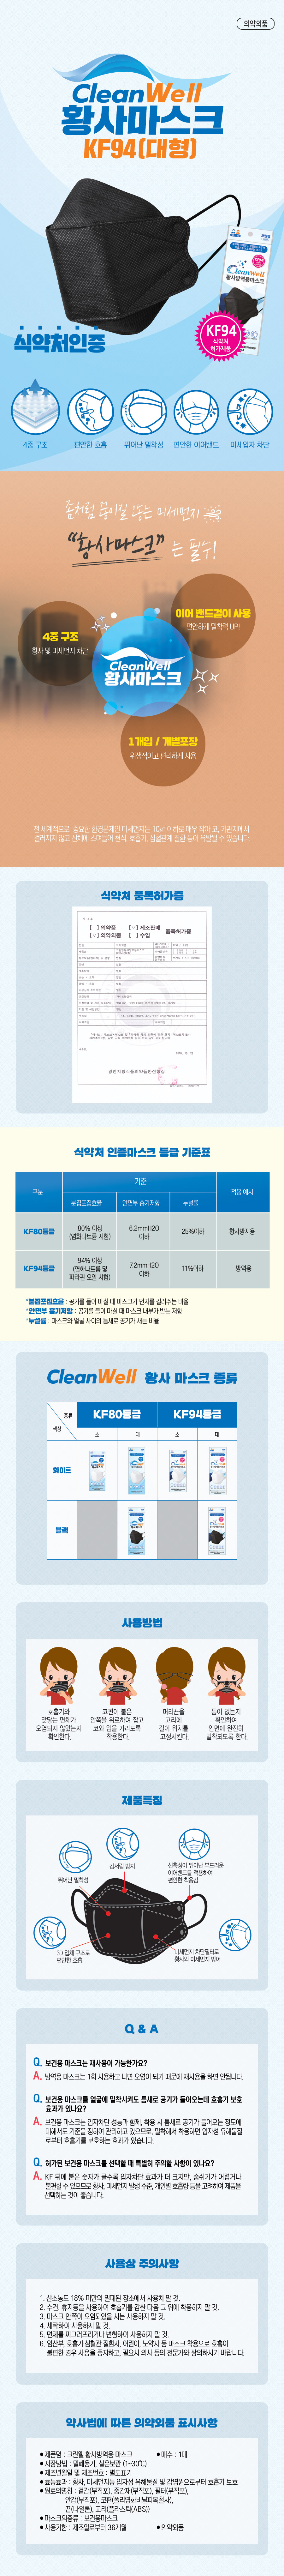 CW-kf94_KL_B.jpg